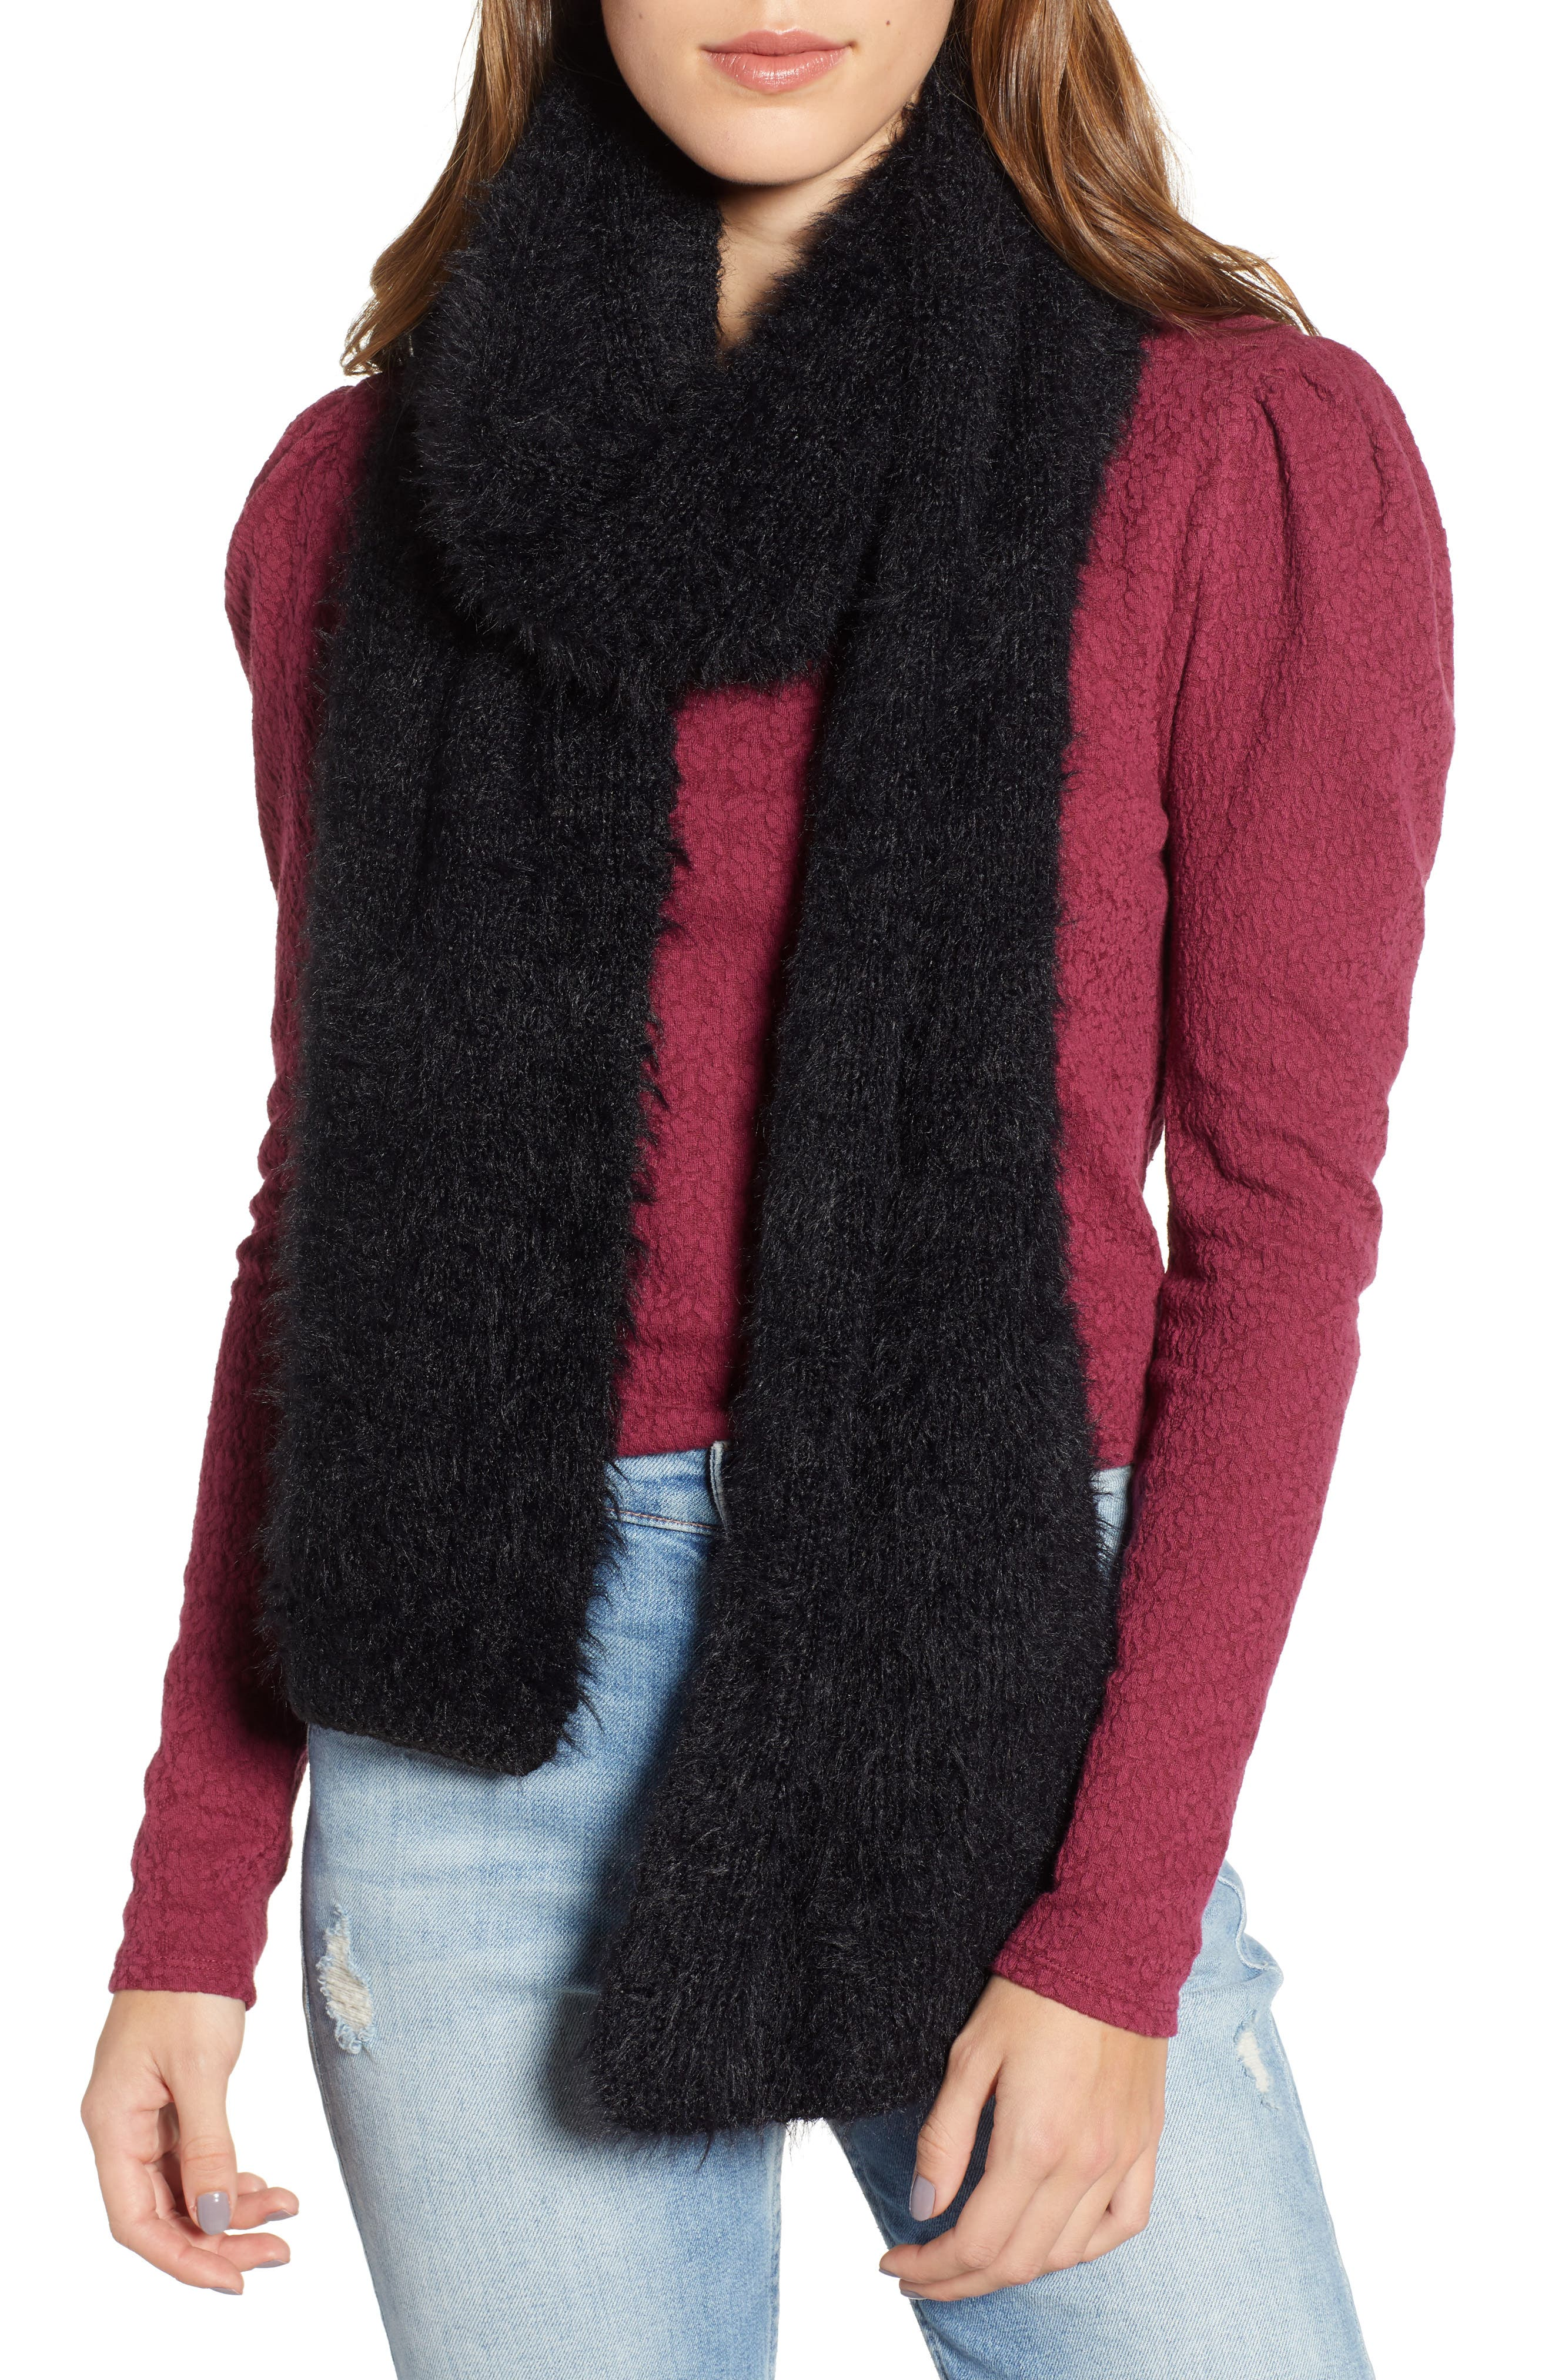 Eyleash Knit Muffler,                         Main,                         color, 001